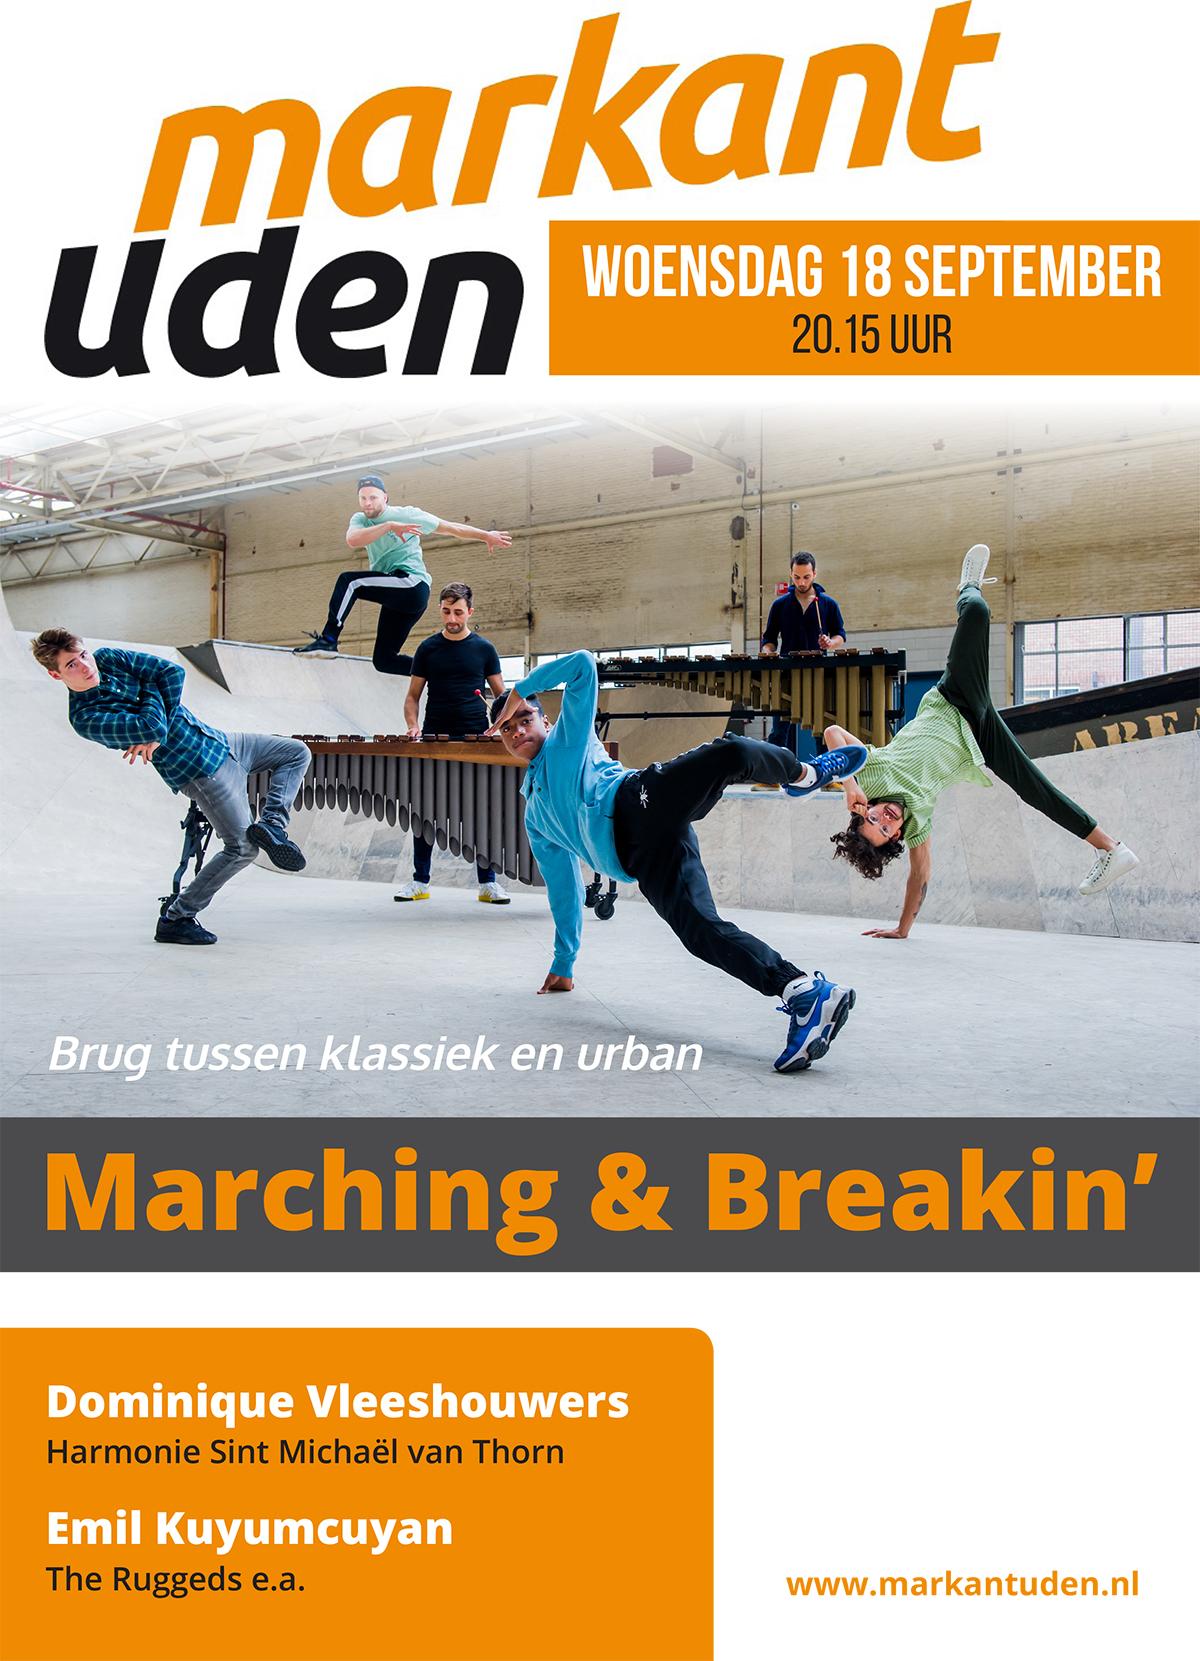 Dominique Uden tot 18 september